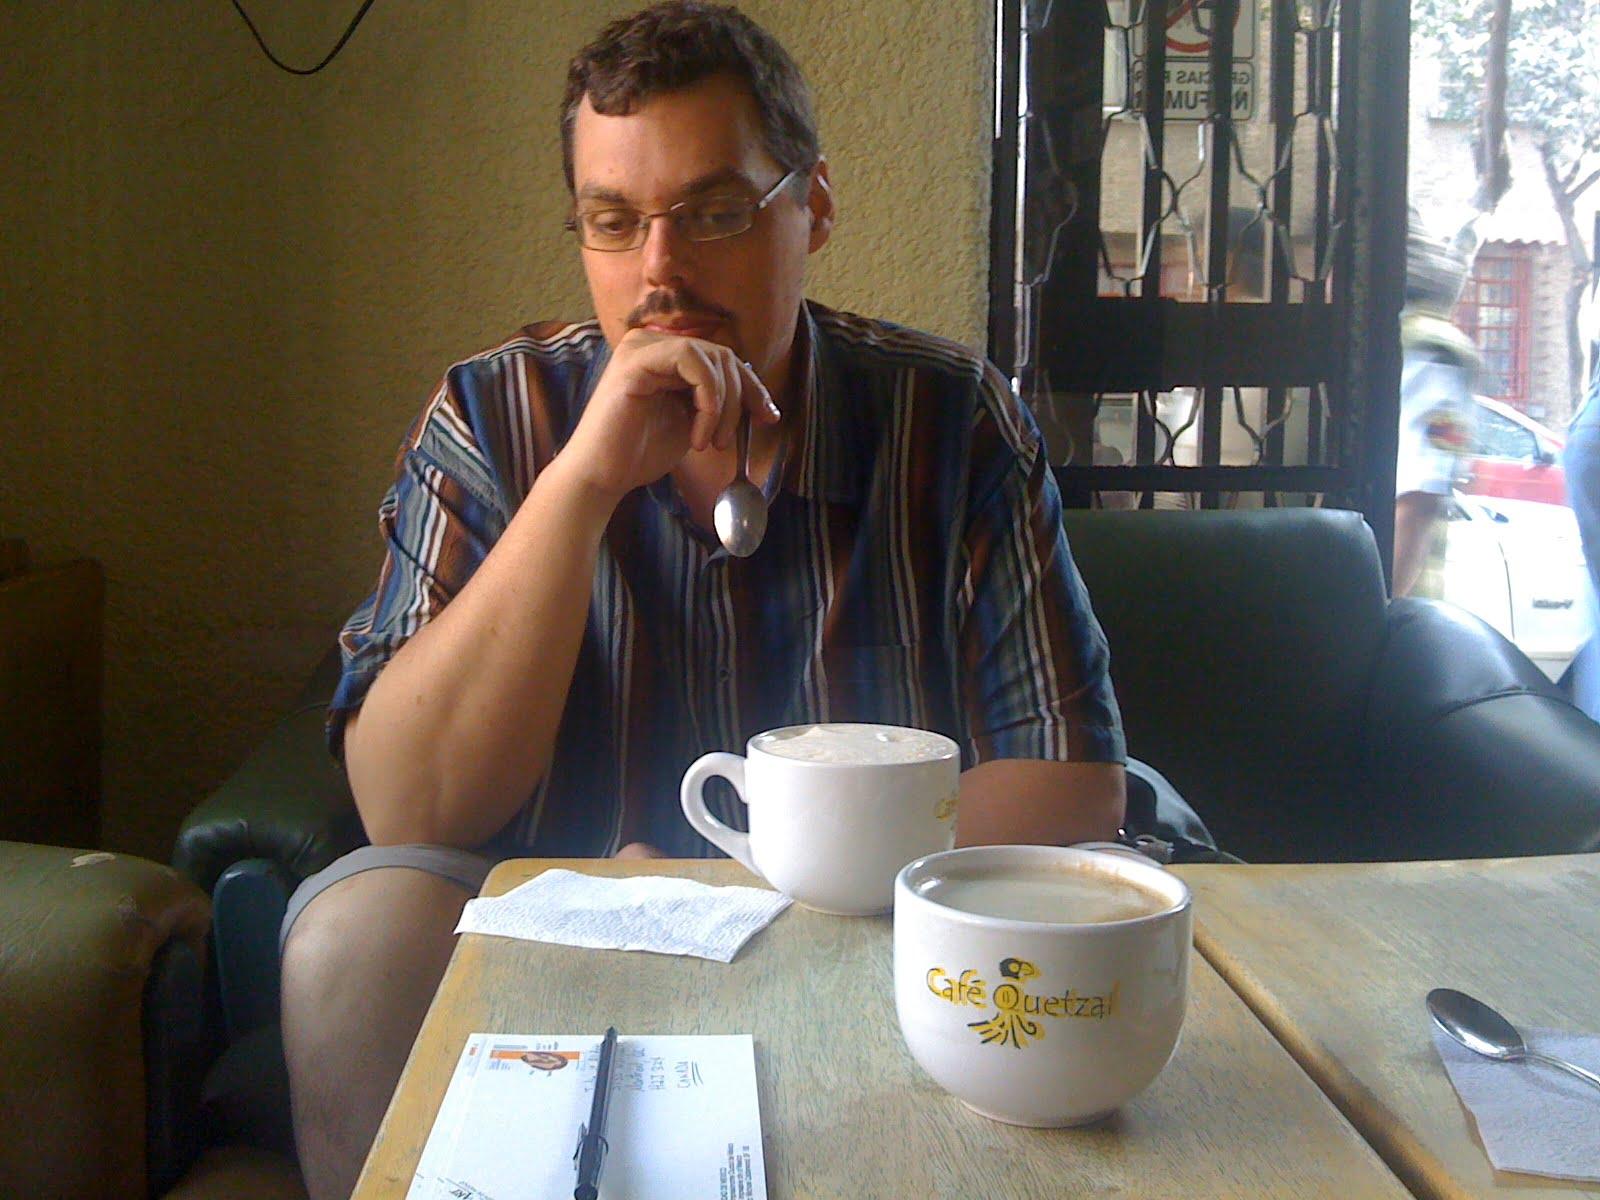 Cafe De Olla Pronunciation